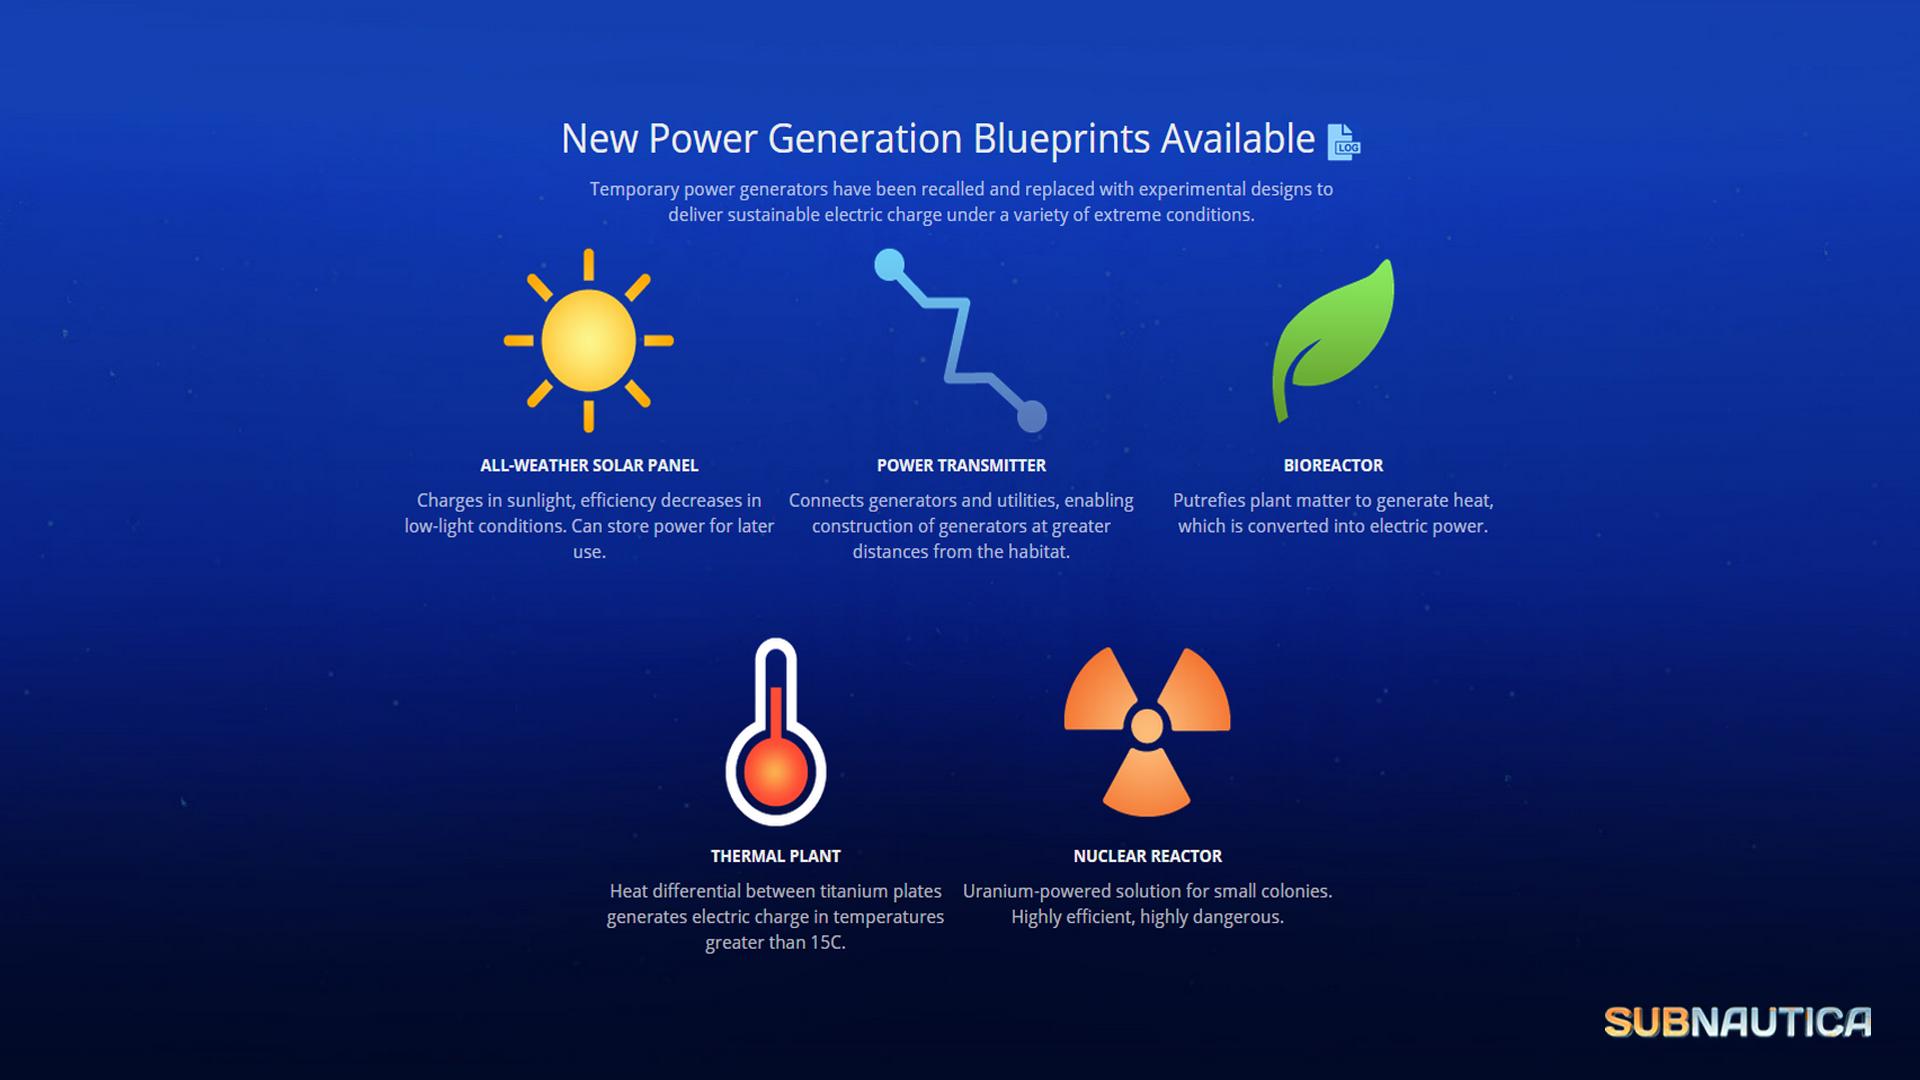 Image power generator blueprintsg subnautica wiki fandom power generator blueprintsg malvernweather Image collections